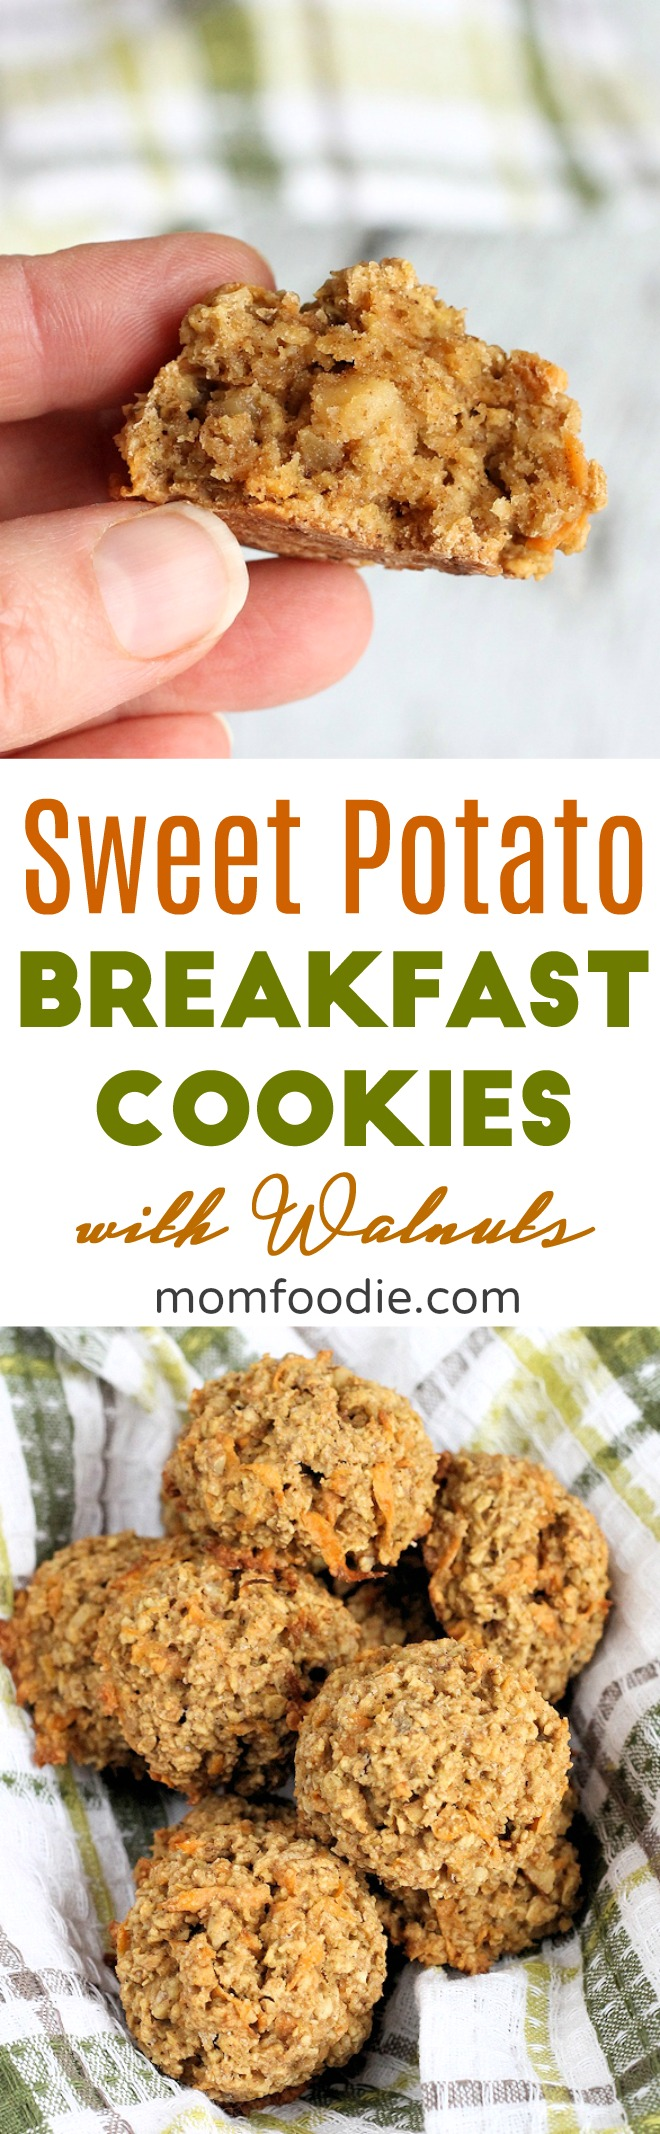 Sweet Potato Breakfast Cookies with Walnuts ... easy healthy breakfast cookie recipe. #breakfast #breakfastcookies